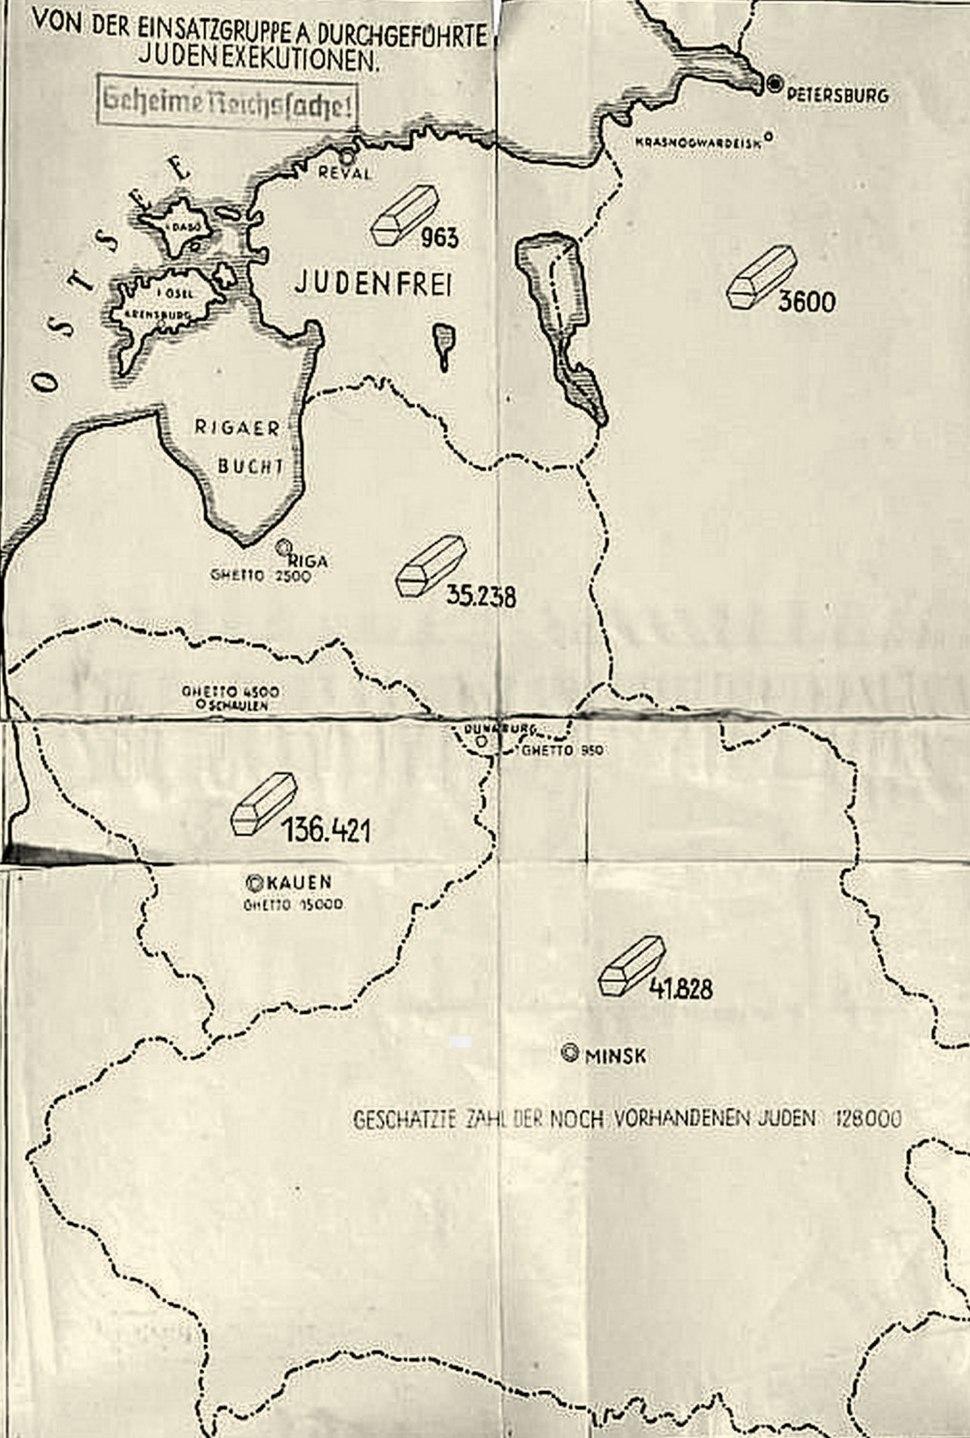 Map Stahlecker's Report 1941-1943